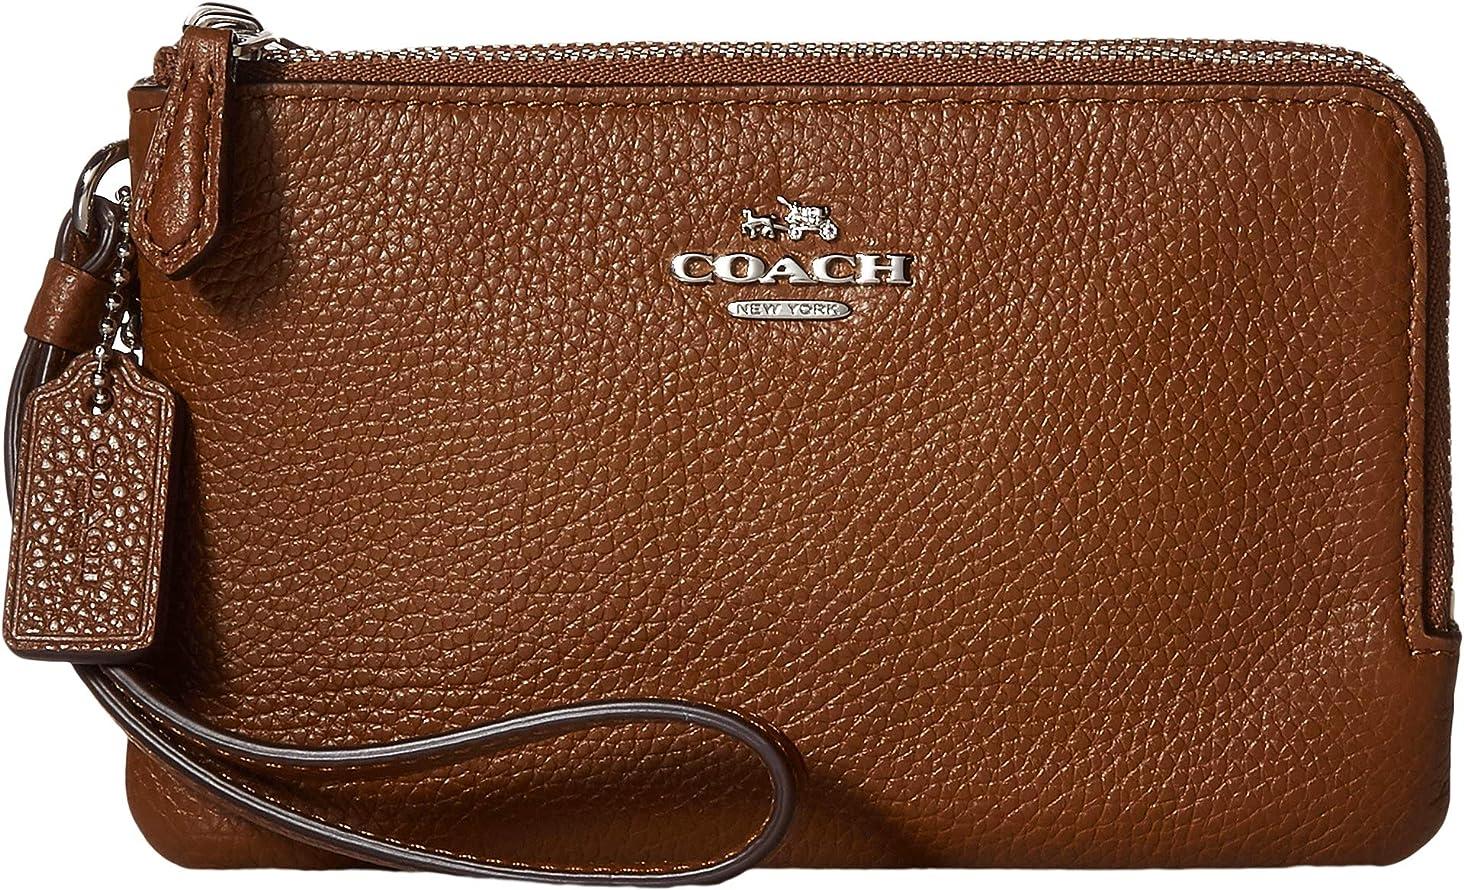 Coach Women's Polished Pebbled Leather Double Corner Zip Bag